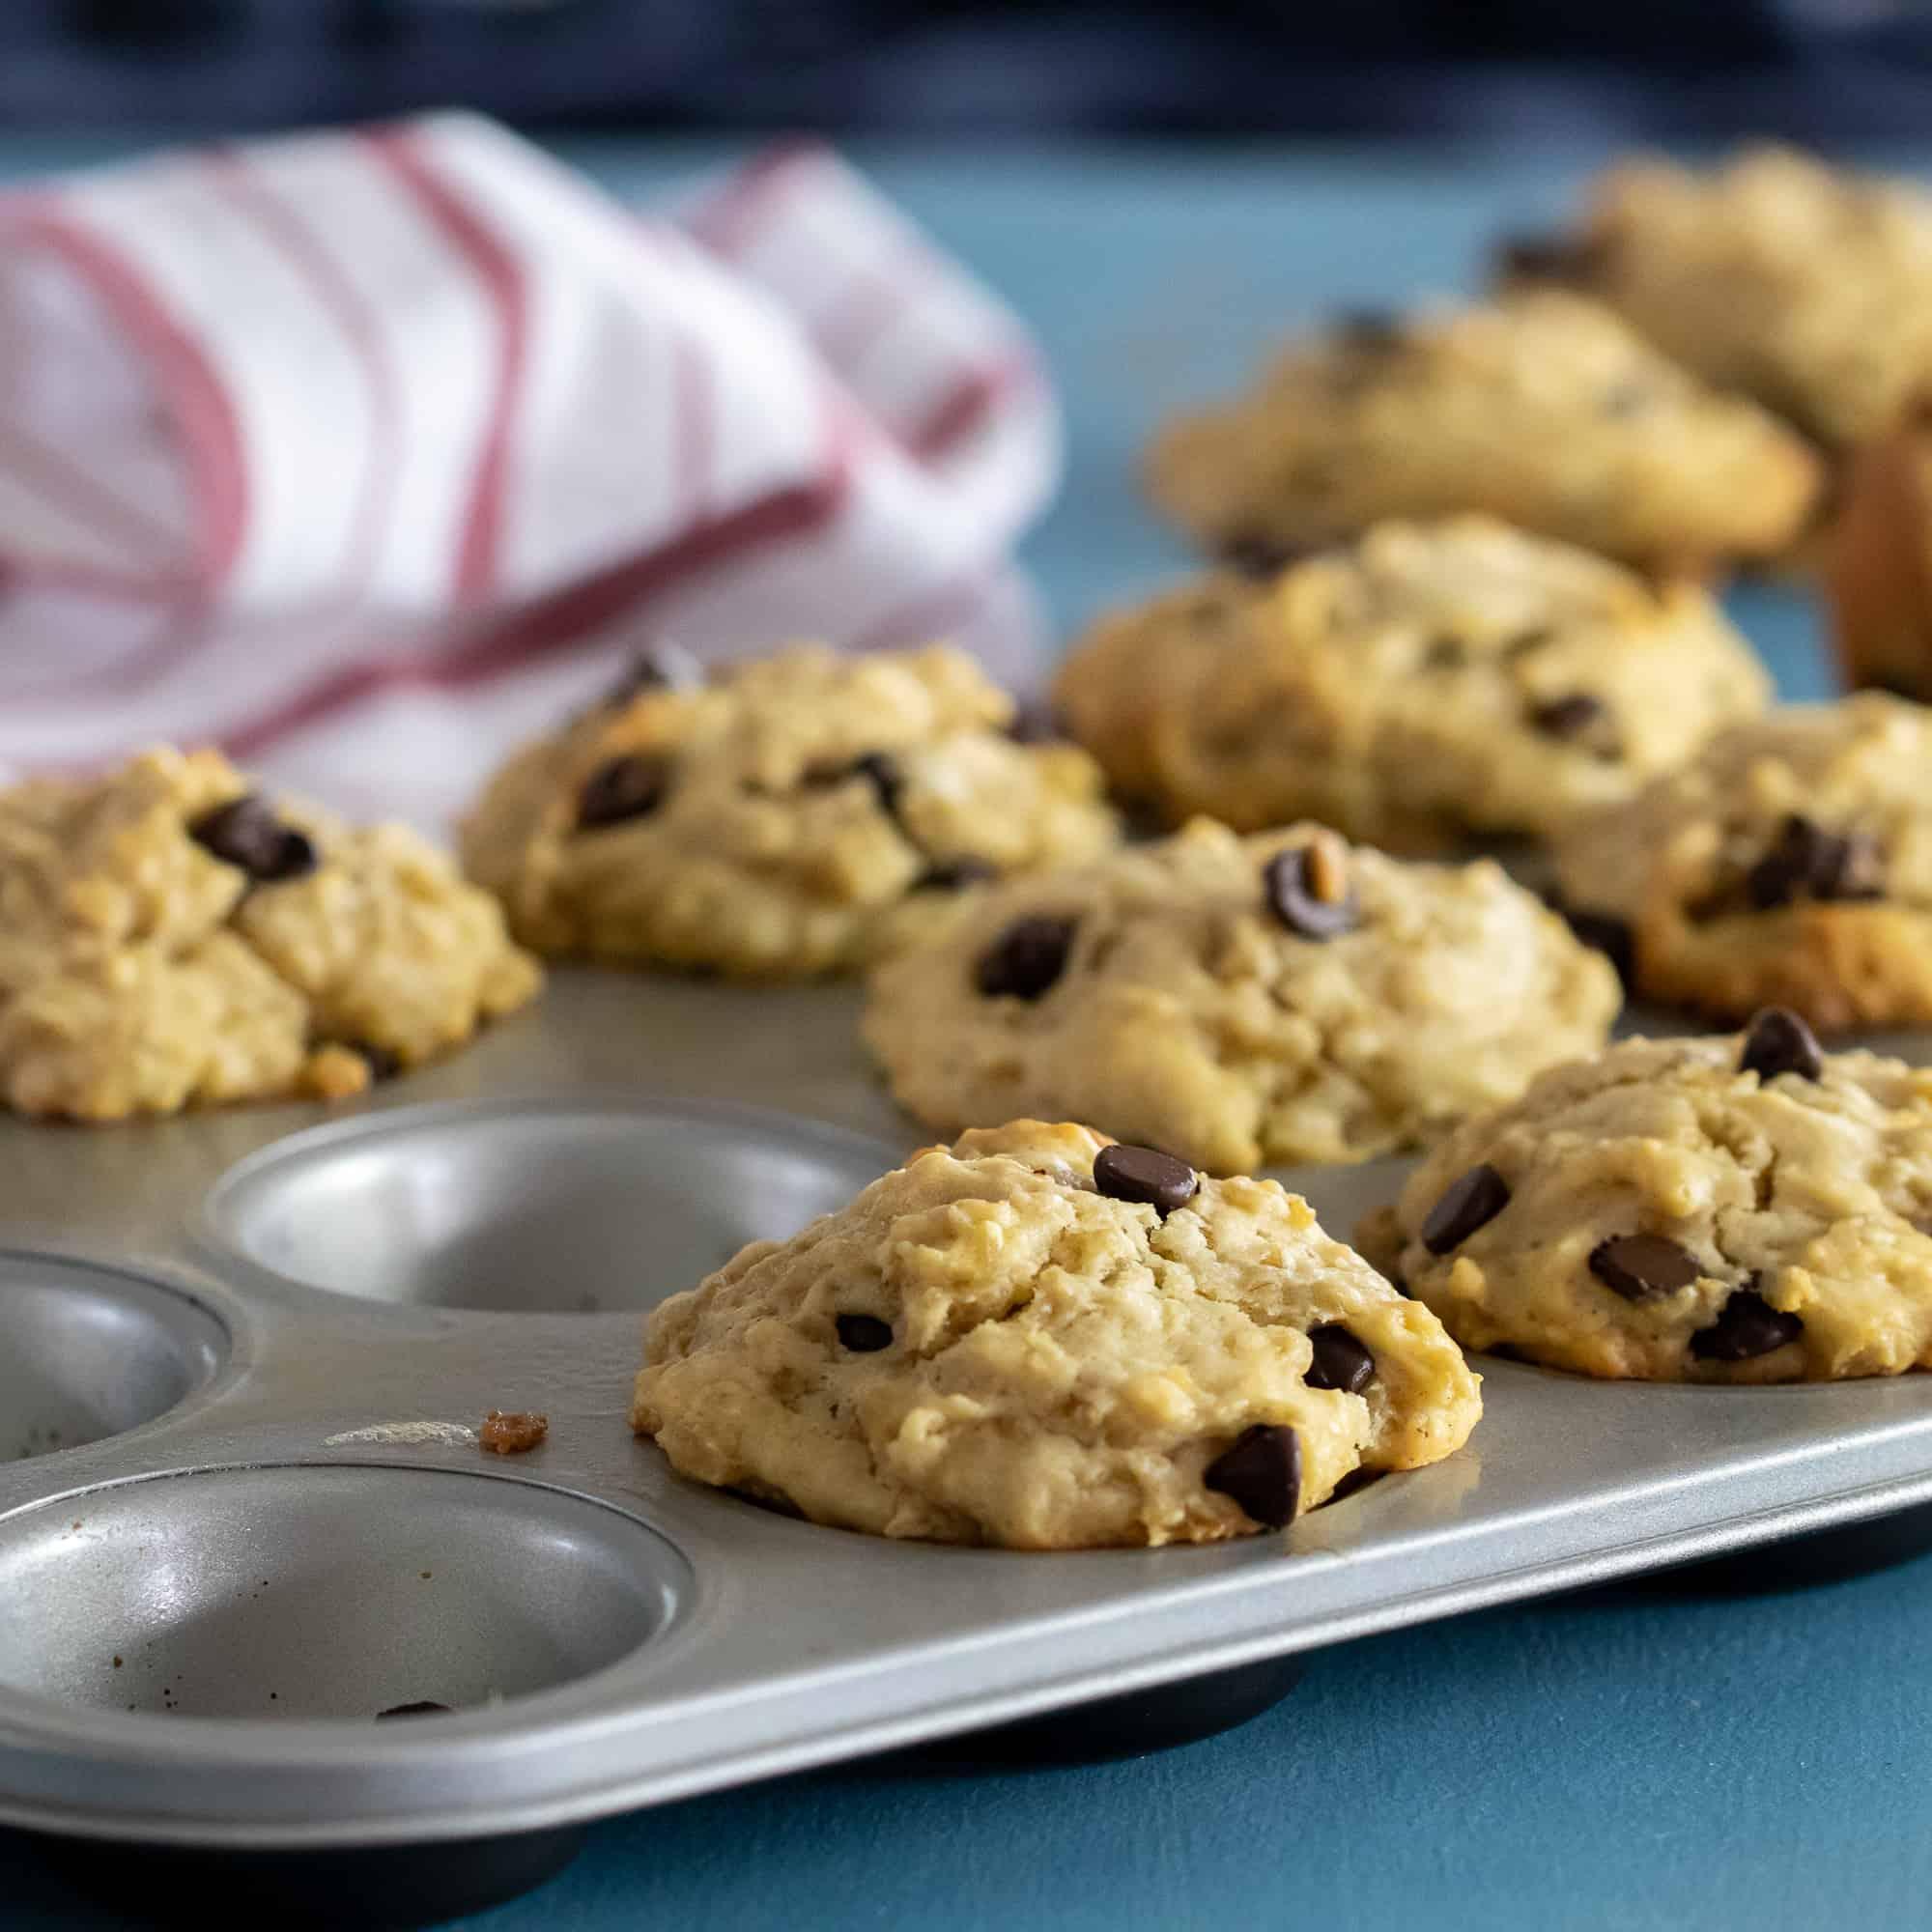 Muffins sitting in metal tin